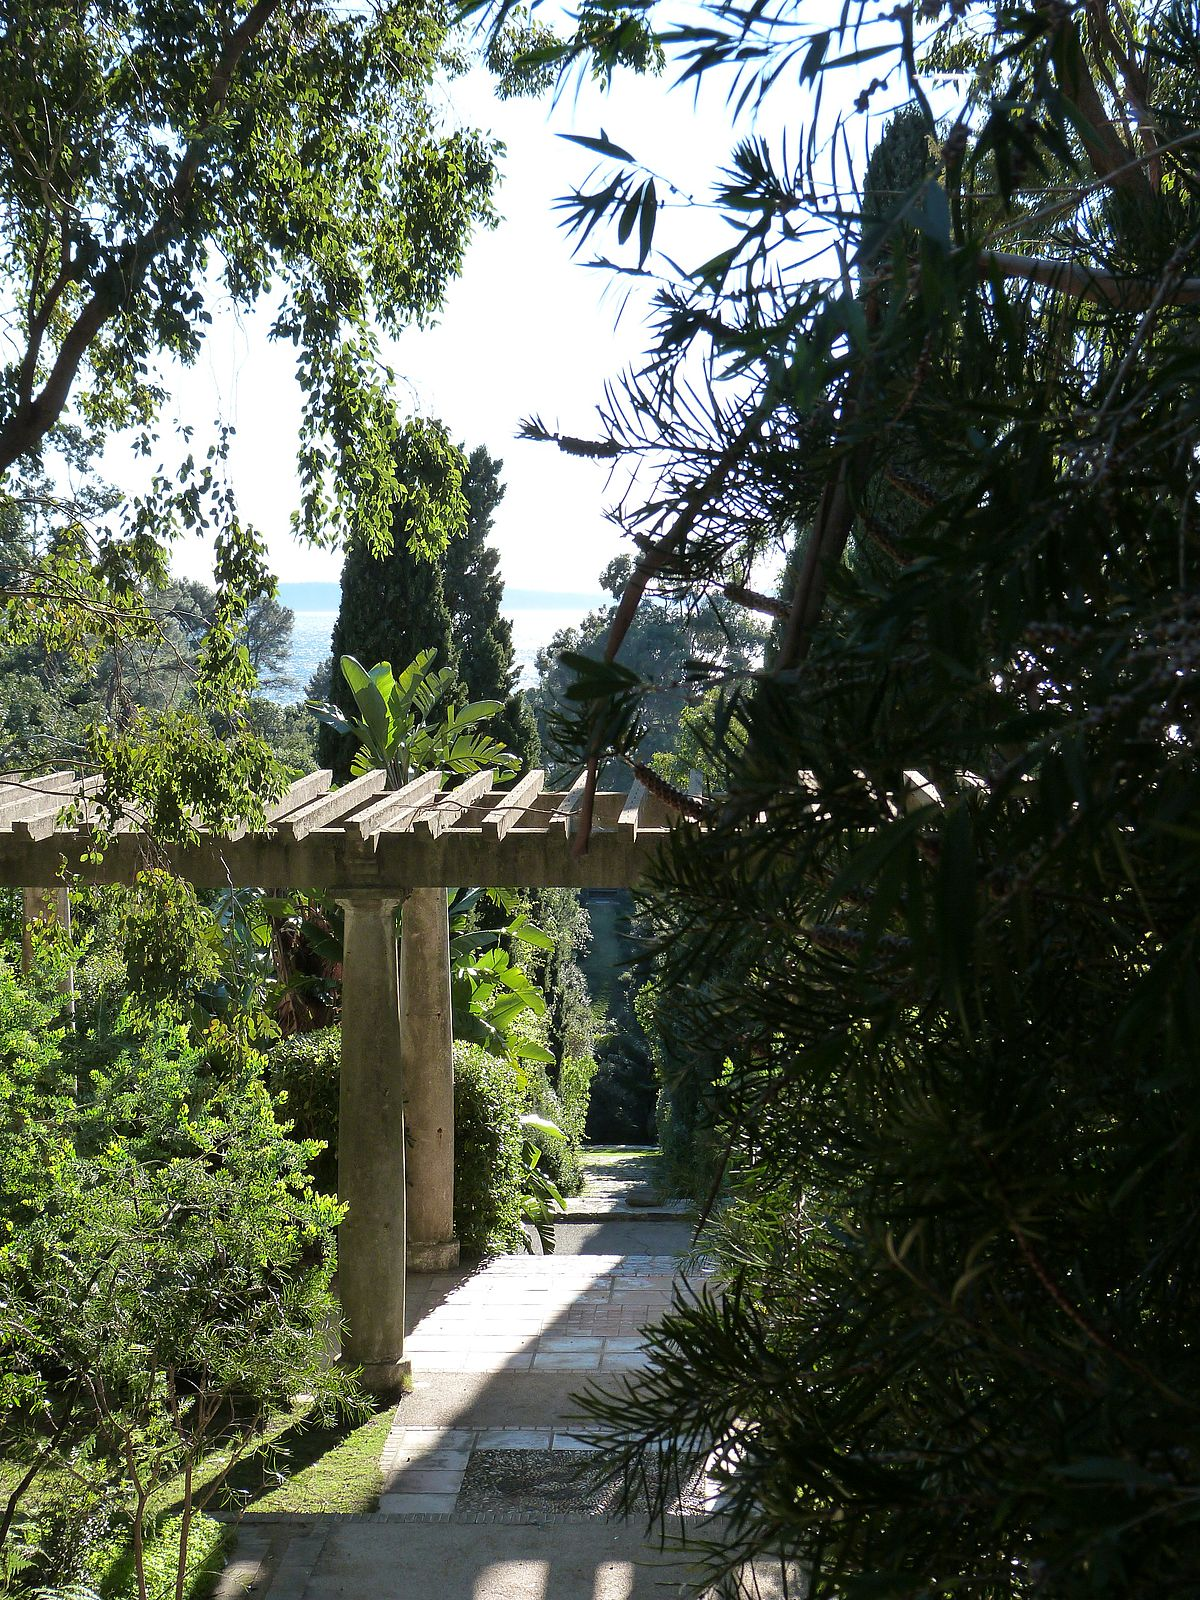 Domaine du rayol wikip dia - Domaine du rayol le jardin des mediterranees ...